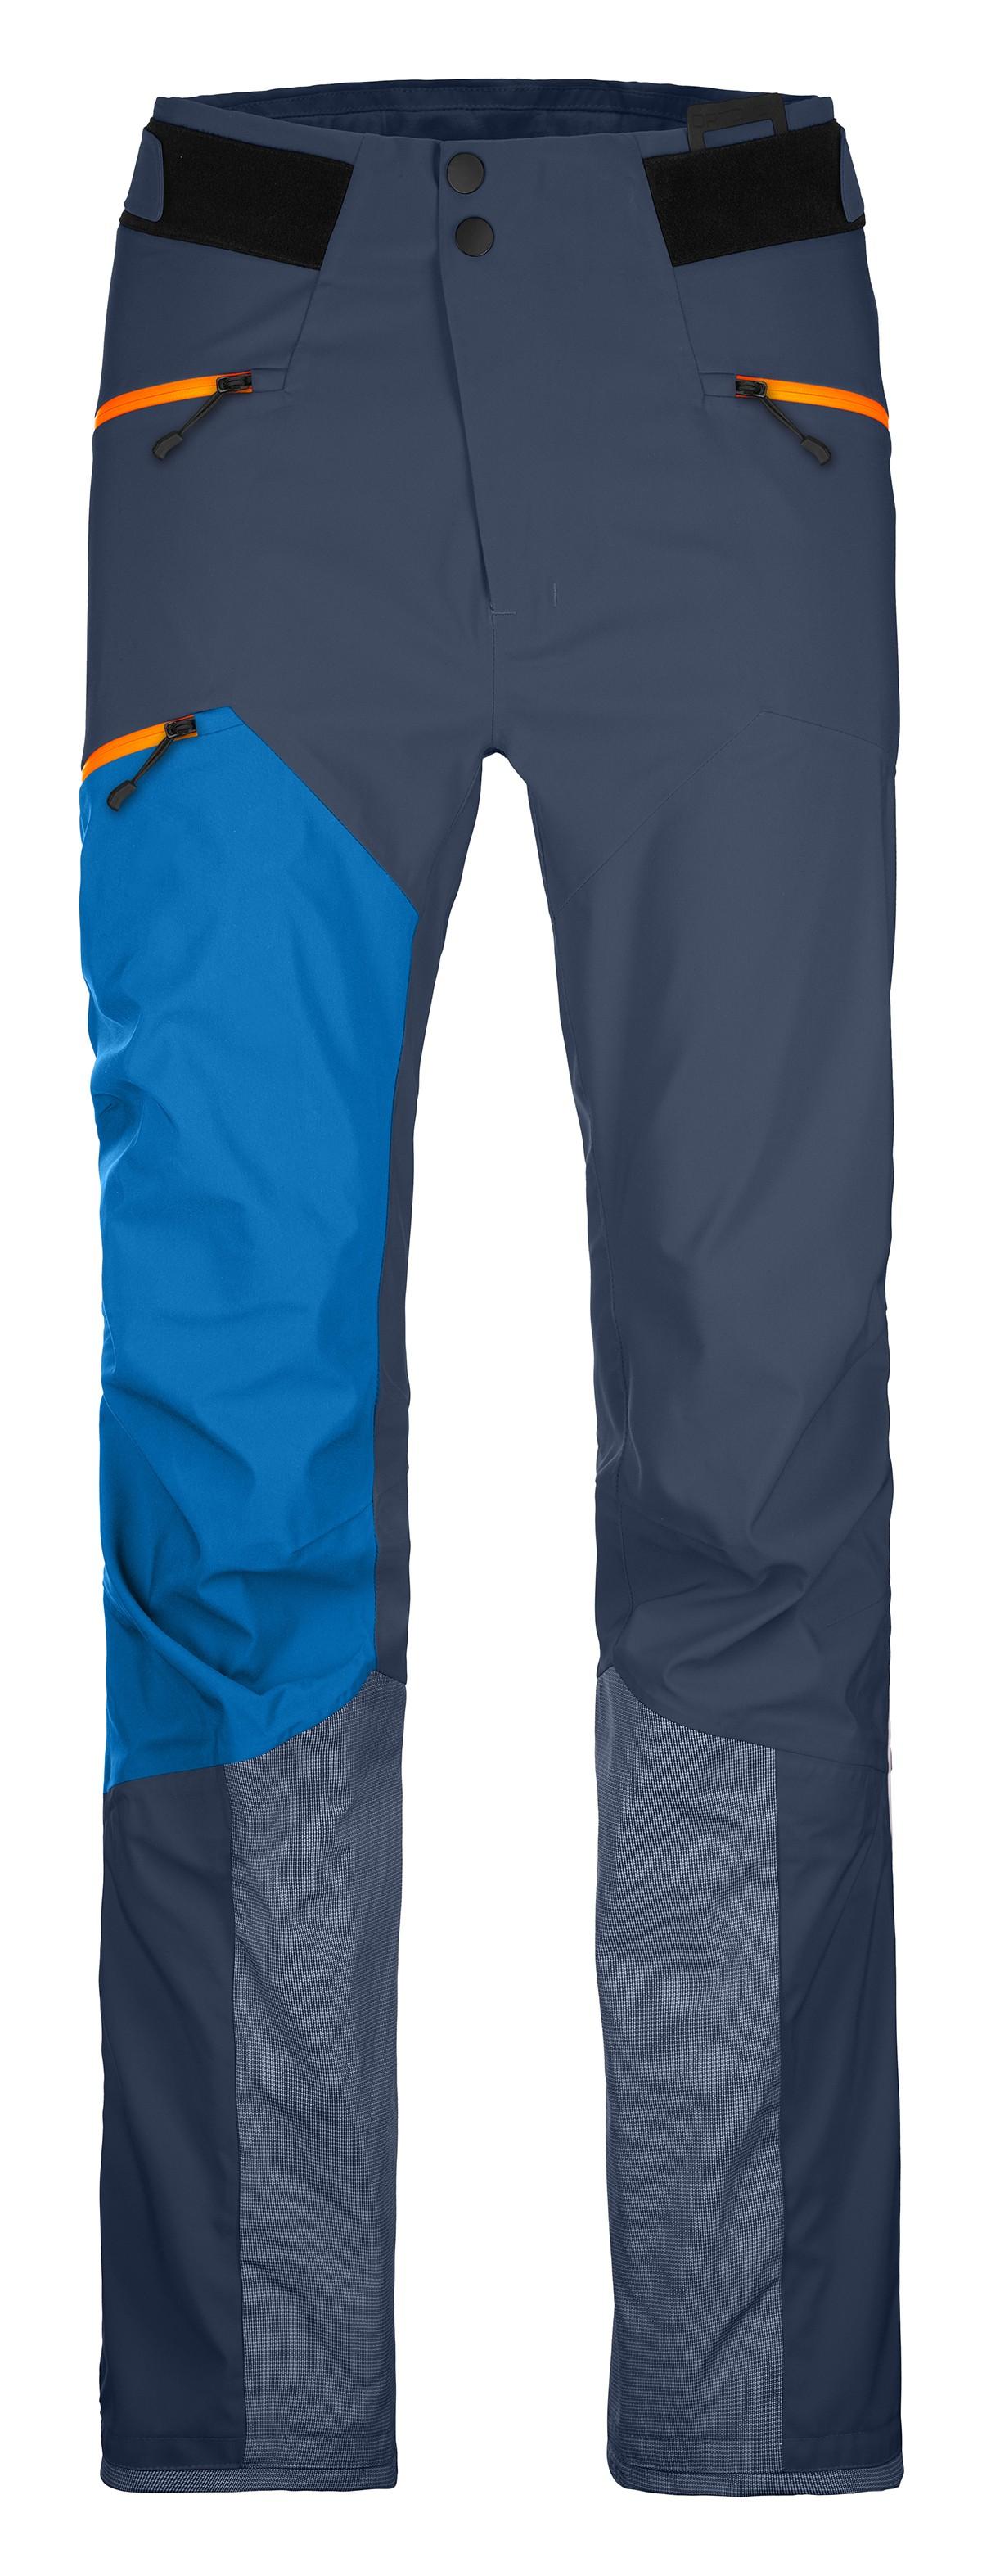 Ortovox Westalpen 3L Pants - Pantaloni alpinismo - Uomo